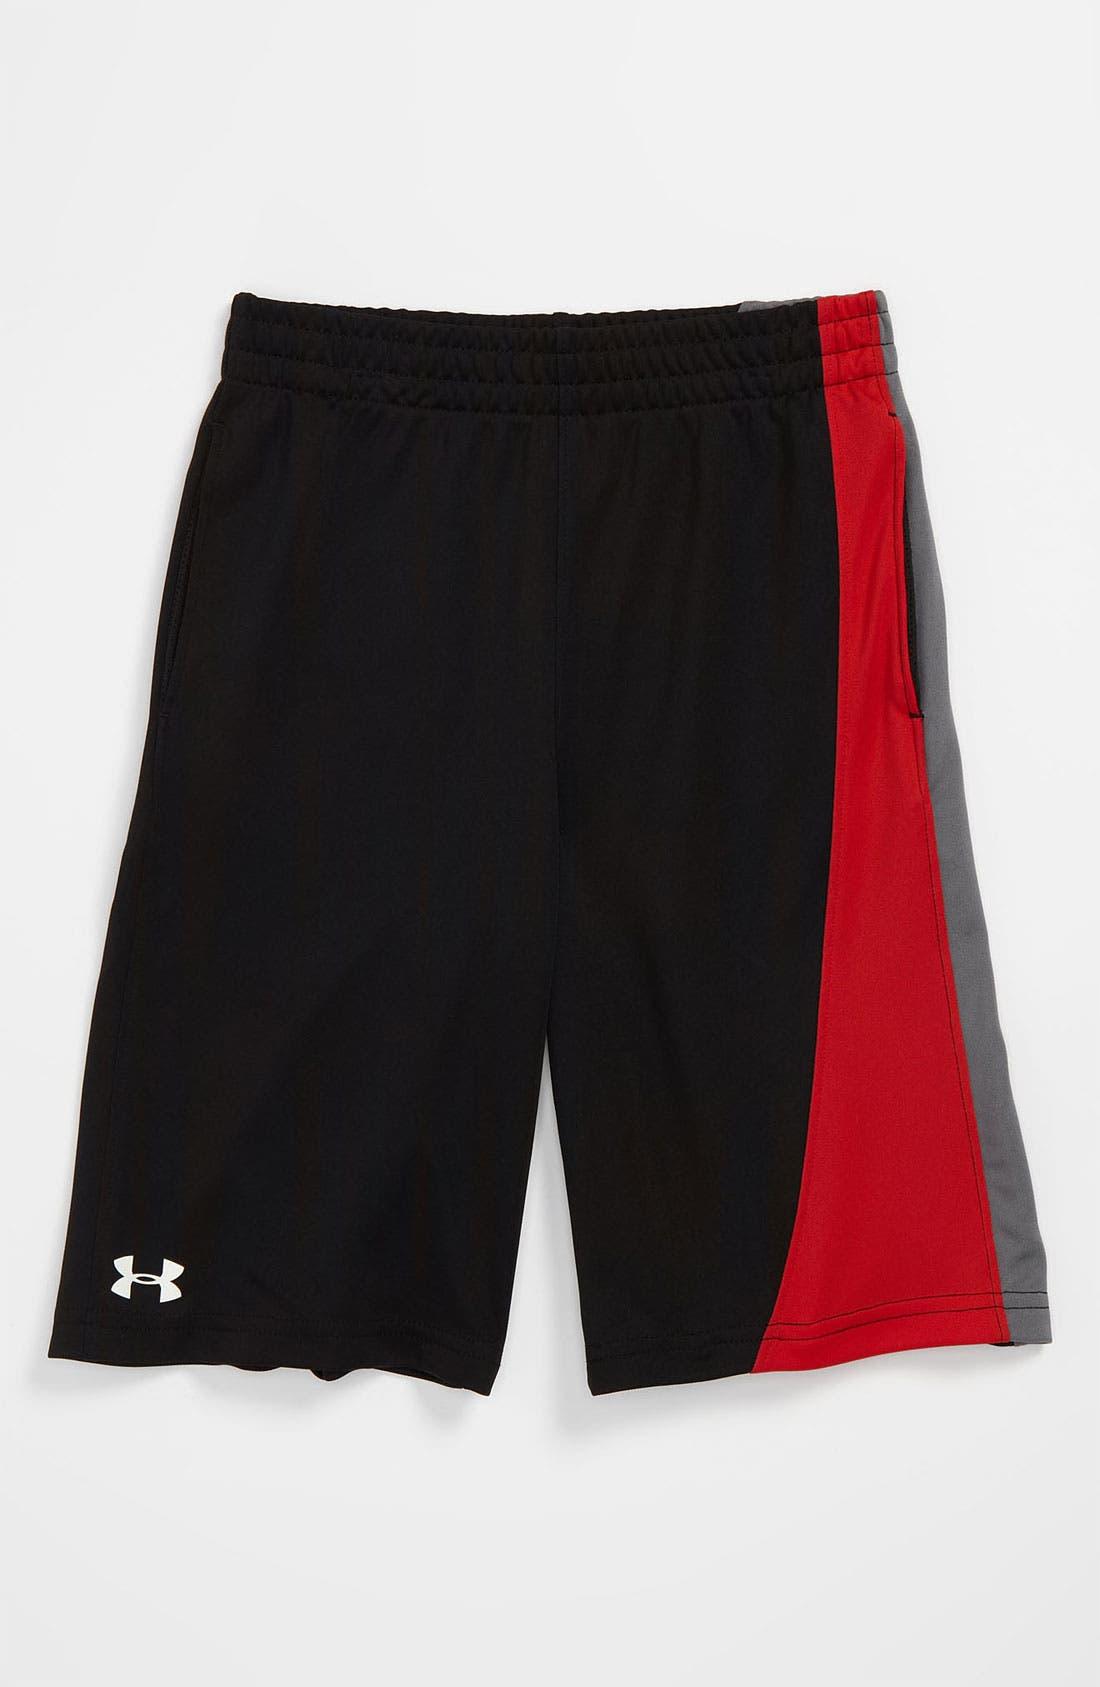 Main Image - Under Armour 'Flip'  HeatGear® Shorts (Little Boys)